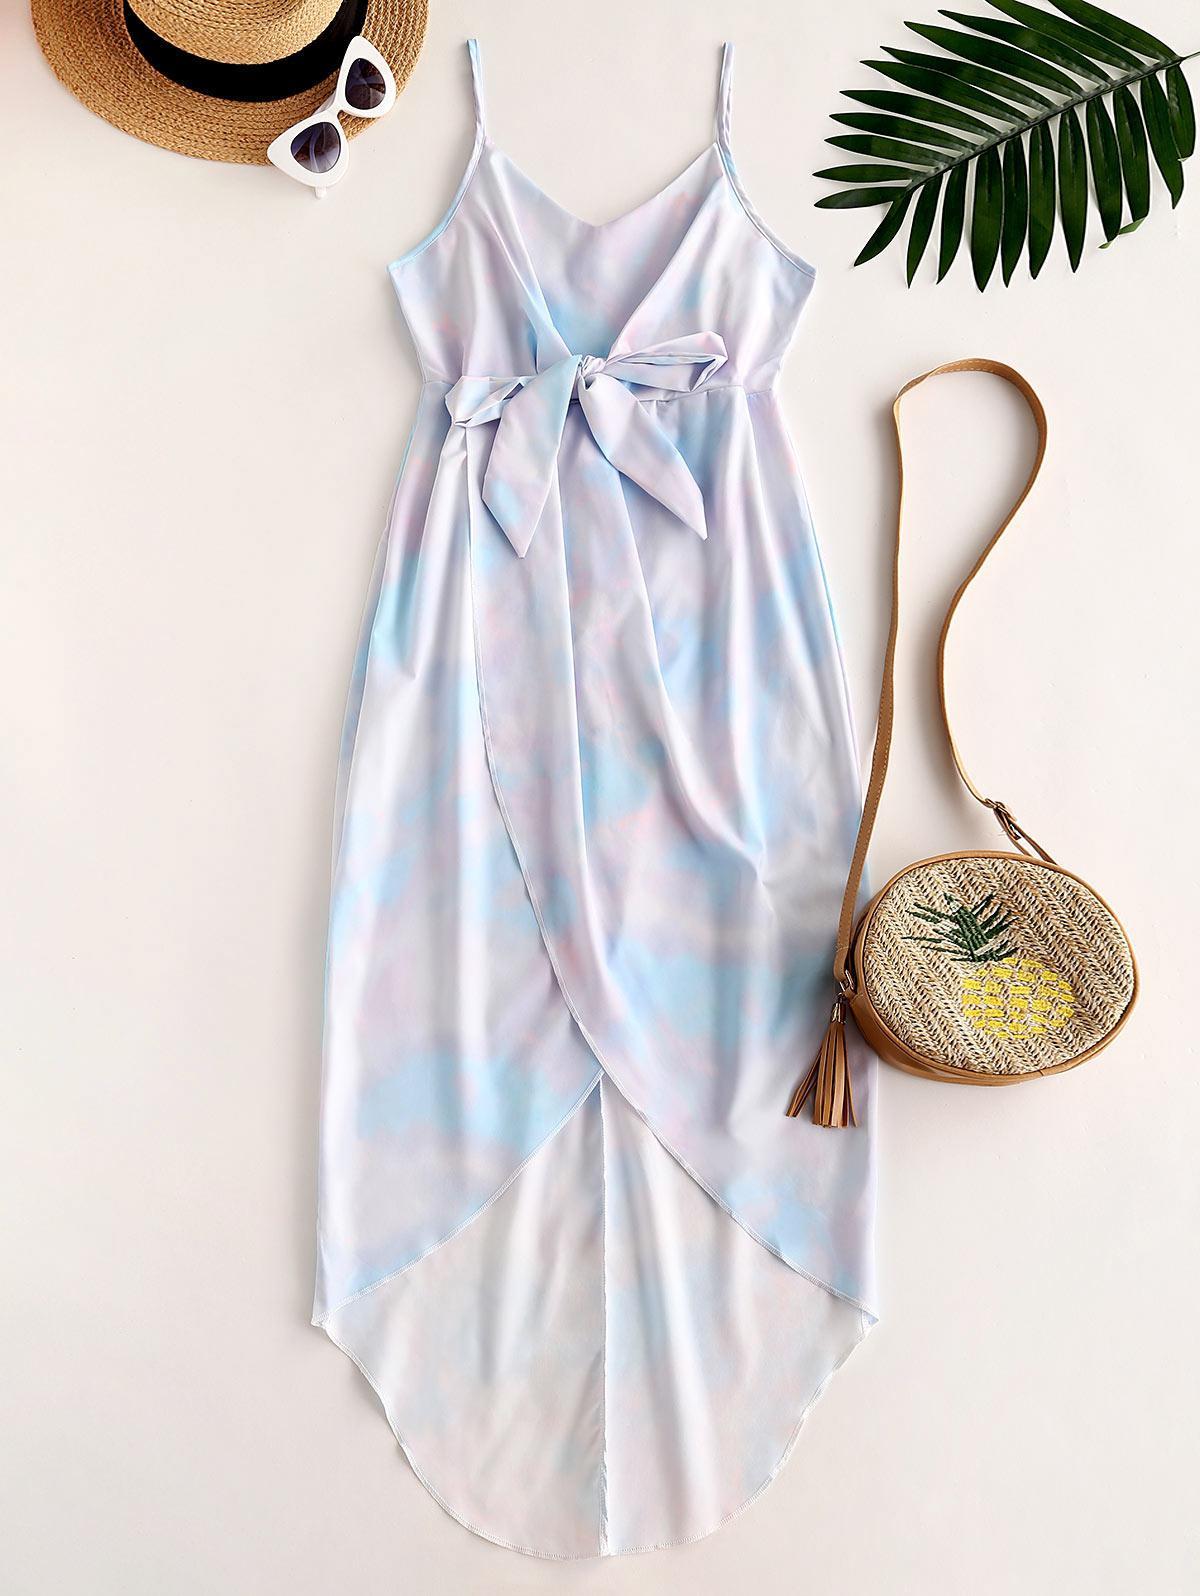 Tie Dye Bowknot Cami Tulip Dress